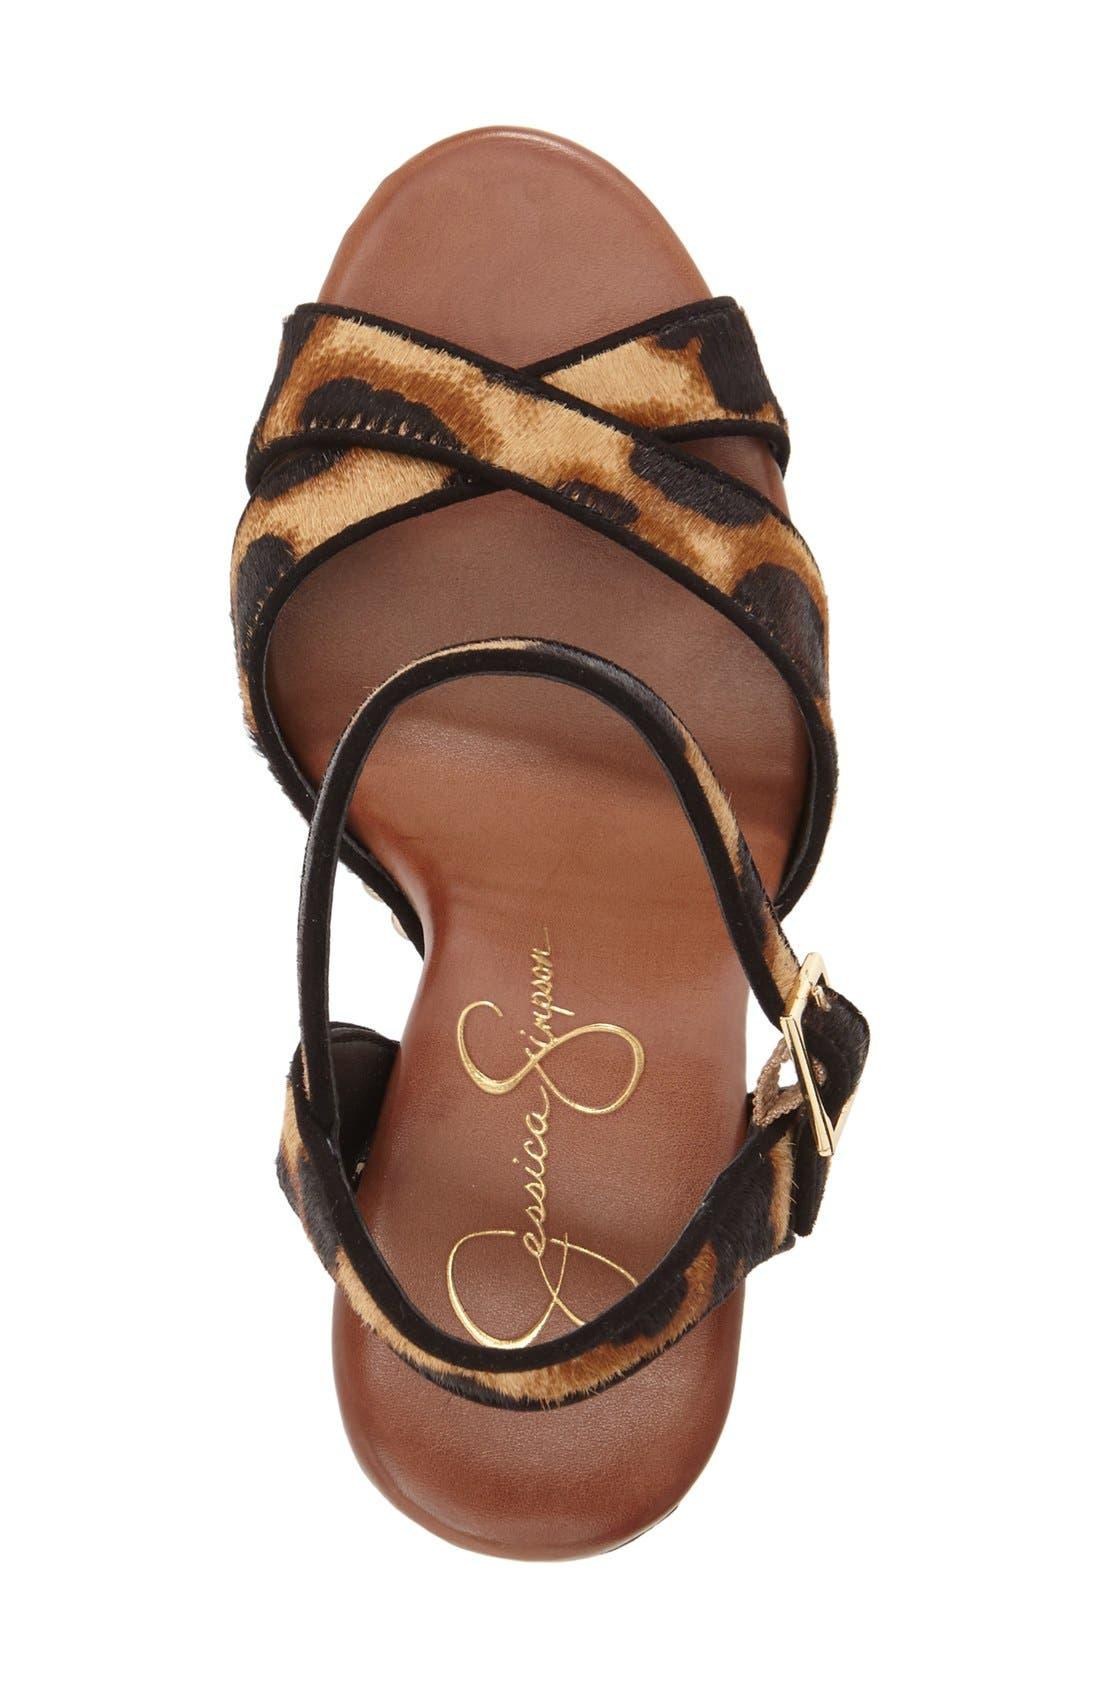 Alternate Image 3  - Jessica Simpson 'Faraday' Platform Sandal (Women)